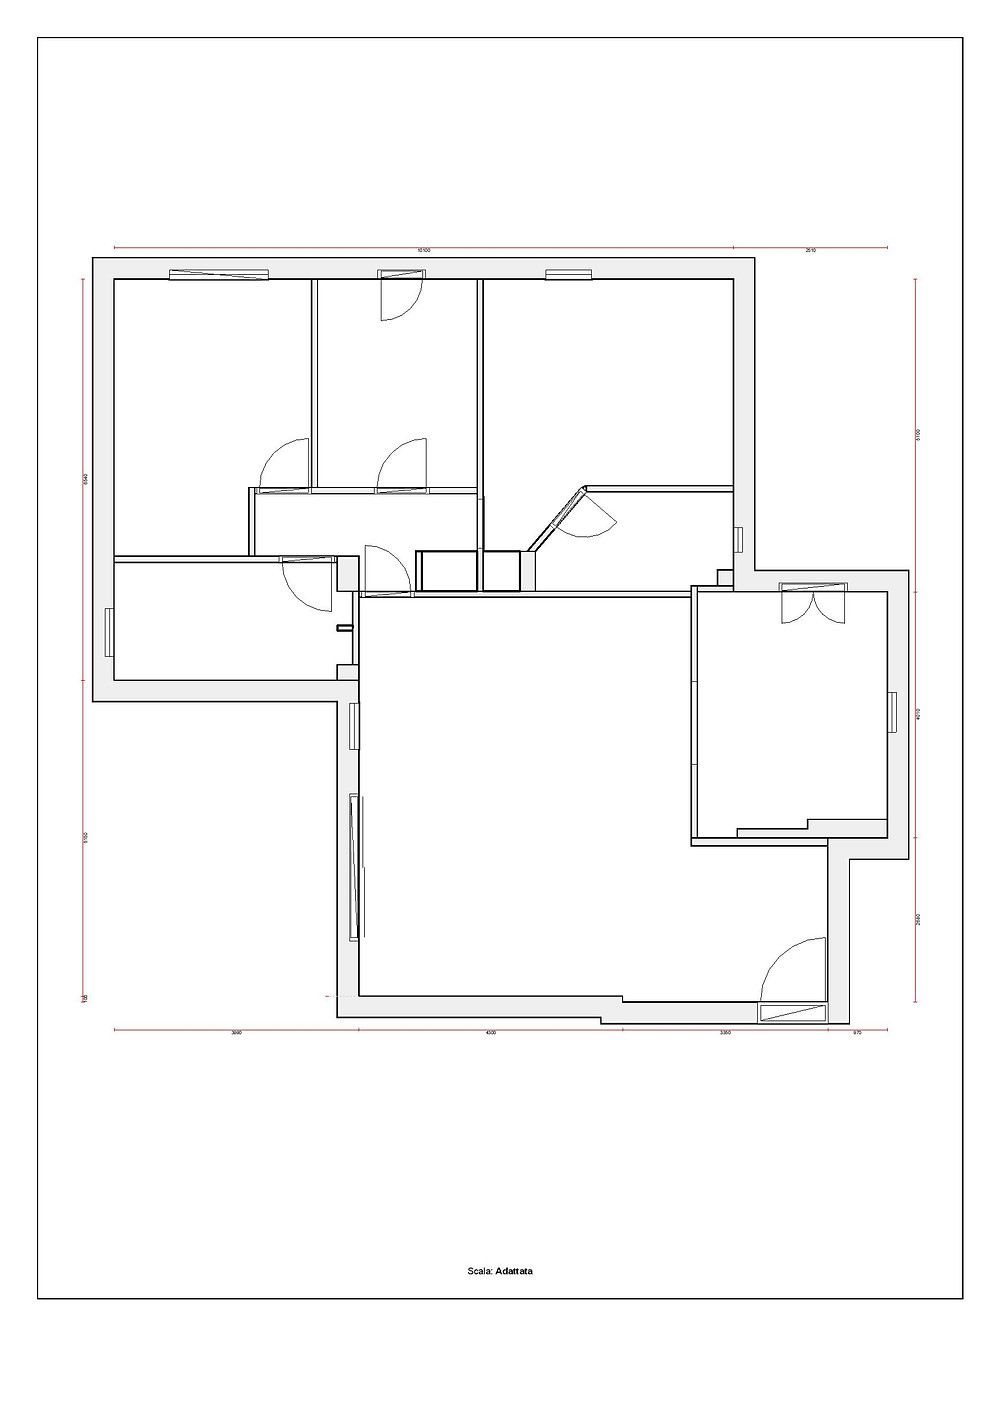 planimetria appartamento su due piani